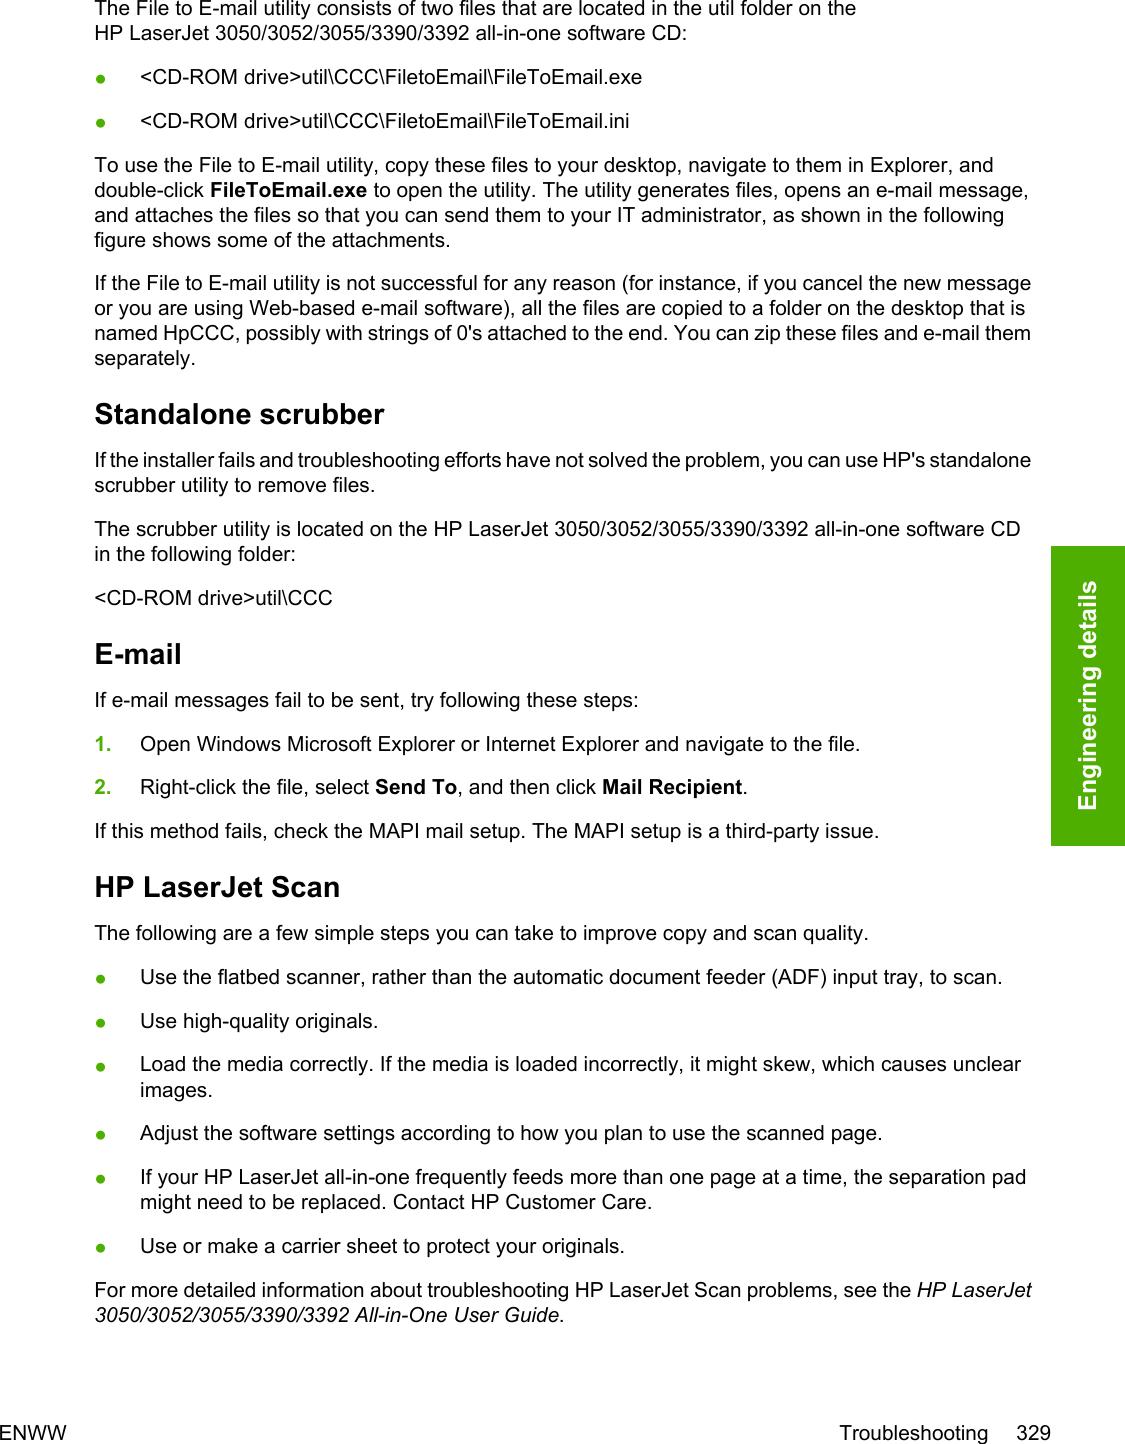 HP LaserJet 3050/3052/3055/3390/3392 All in One Software Technical